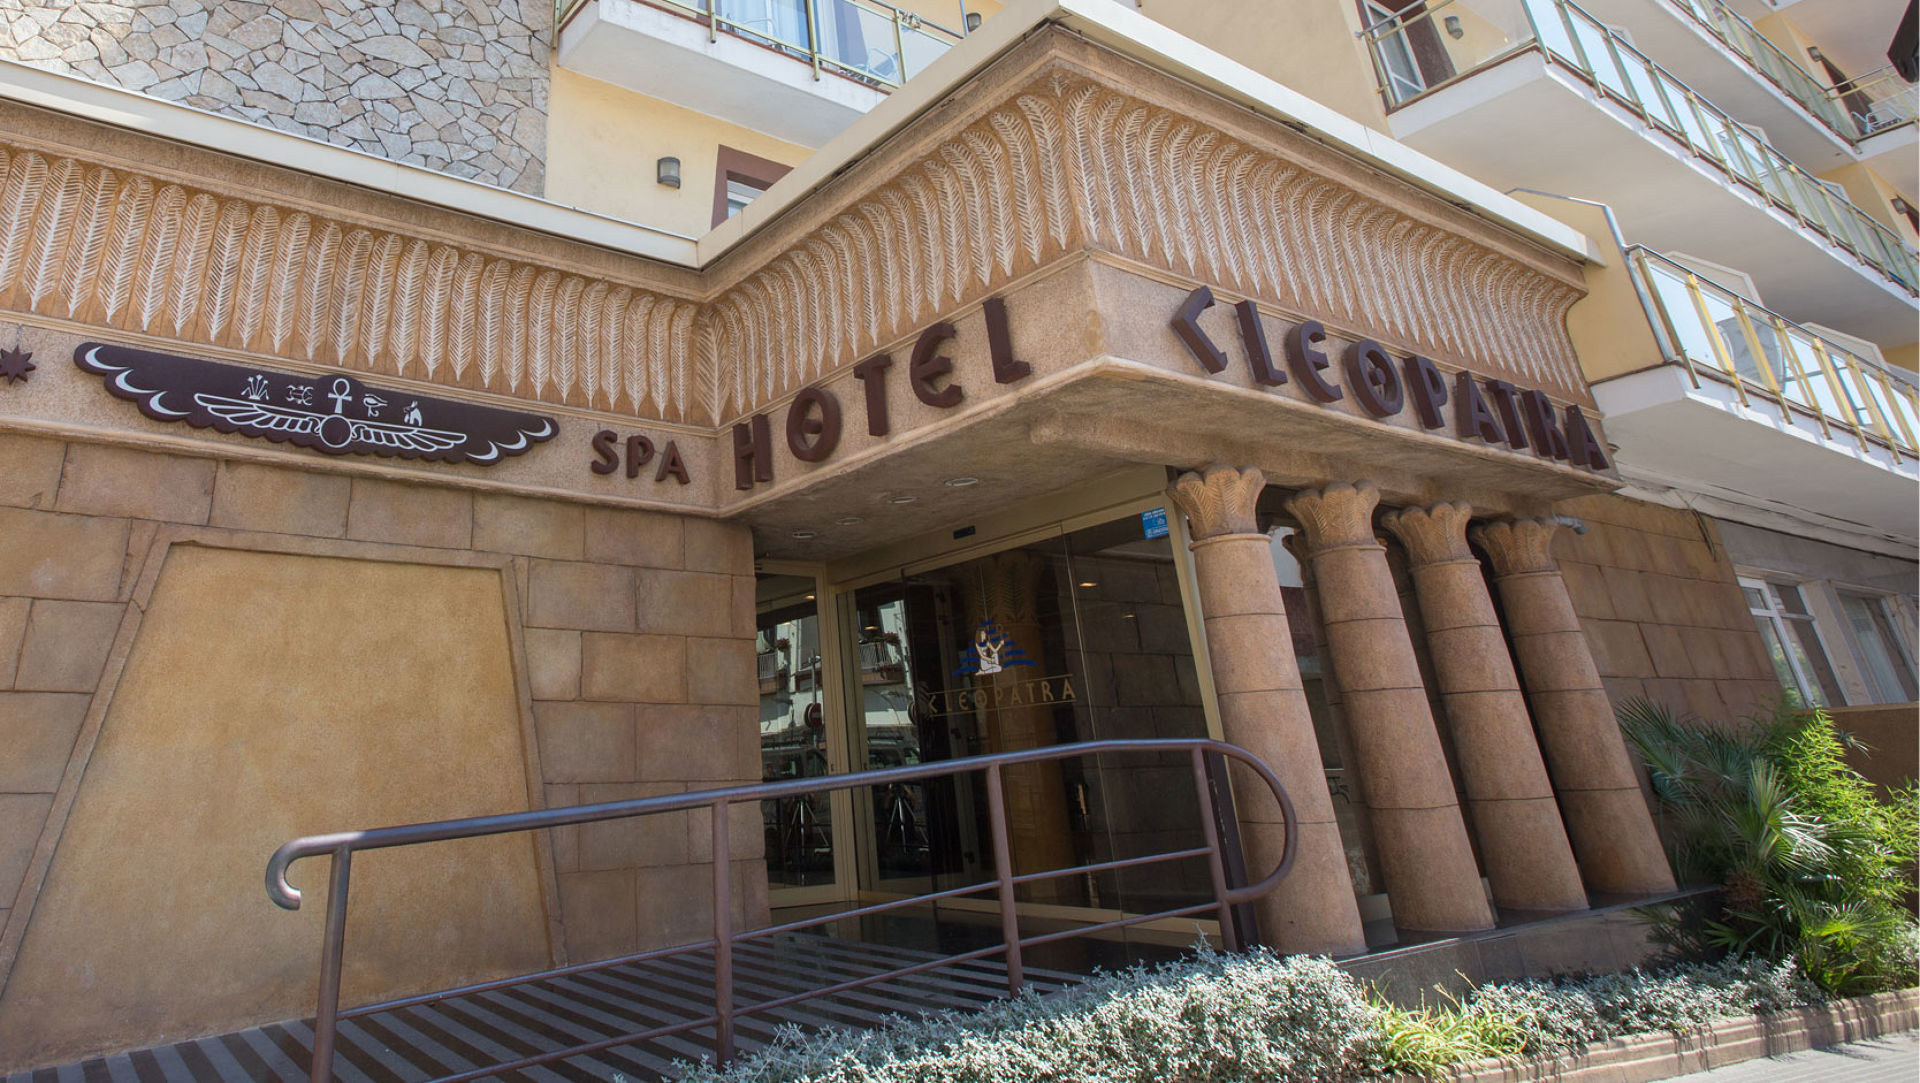 3937a-foto-entrada-hotel-cleopatra.jpg